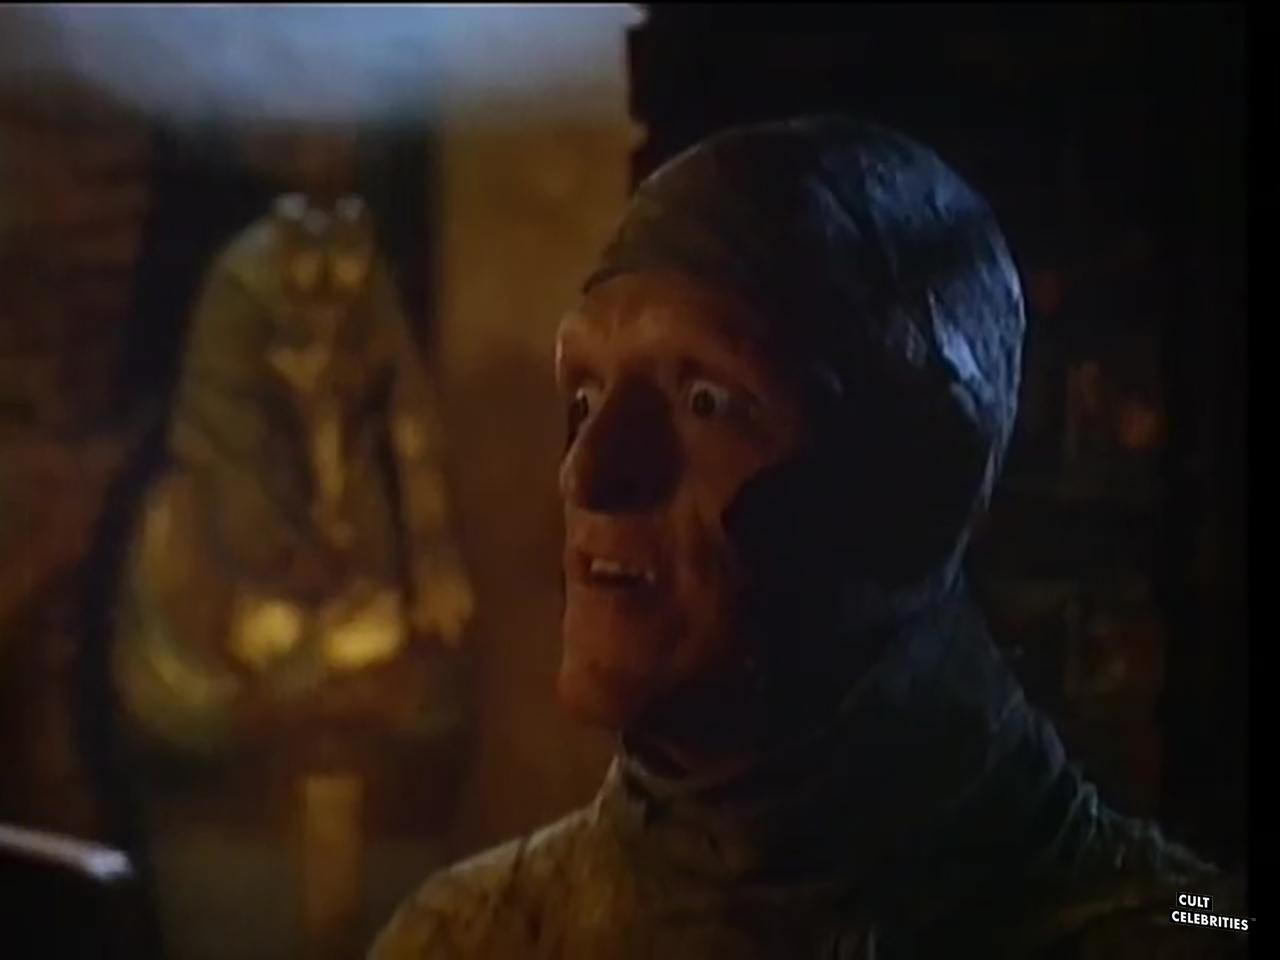 Michael Berryman in Saturday the 14th Strikes Back (1988)